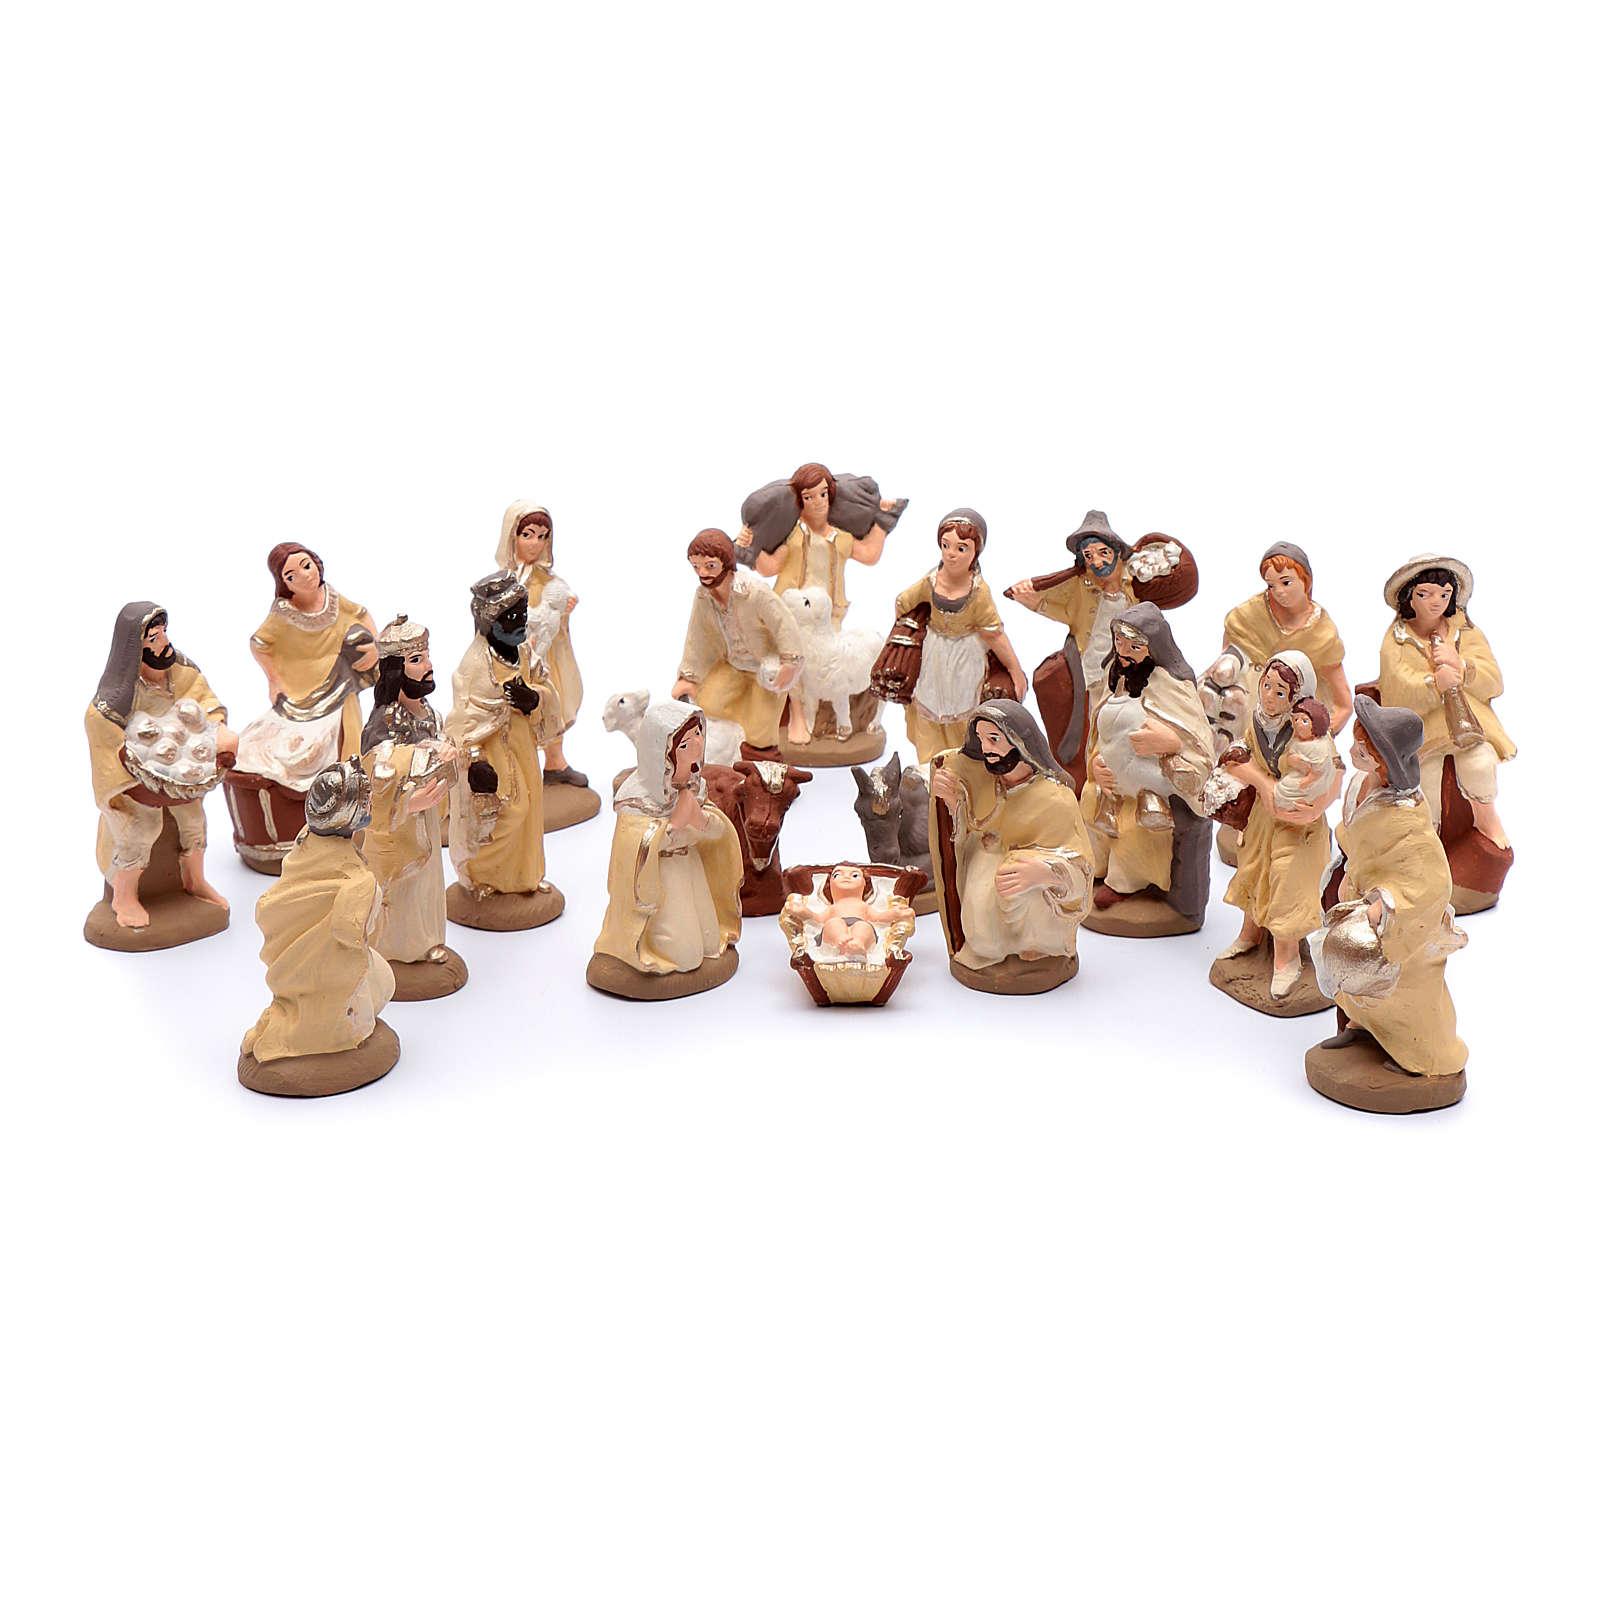 Presepe terracotta dipinta 20 statuine 10 cm 4